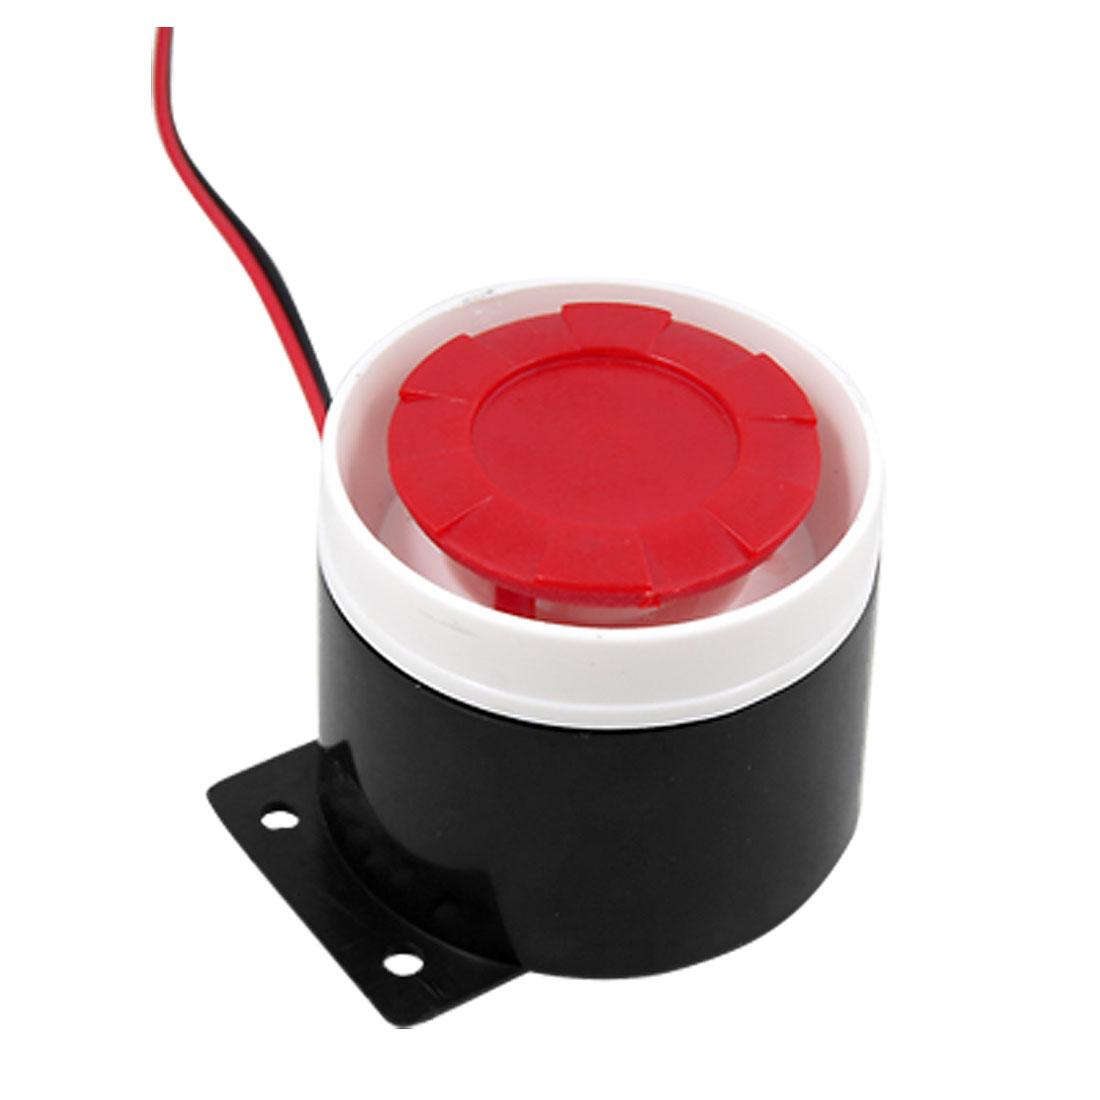 DC 12V Black Red Alarm Buzzer Ringer Annunciator